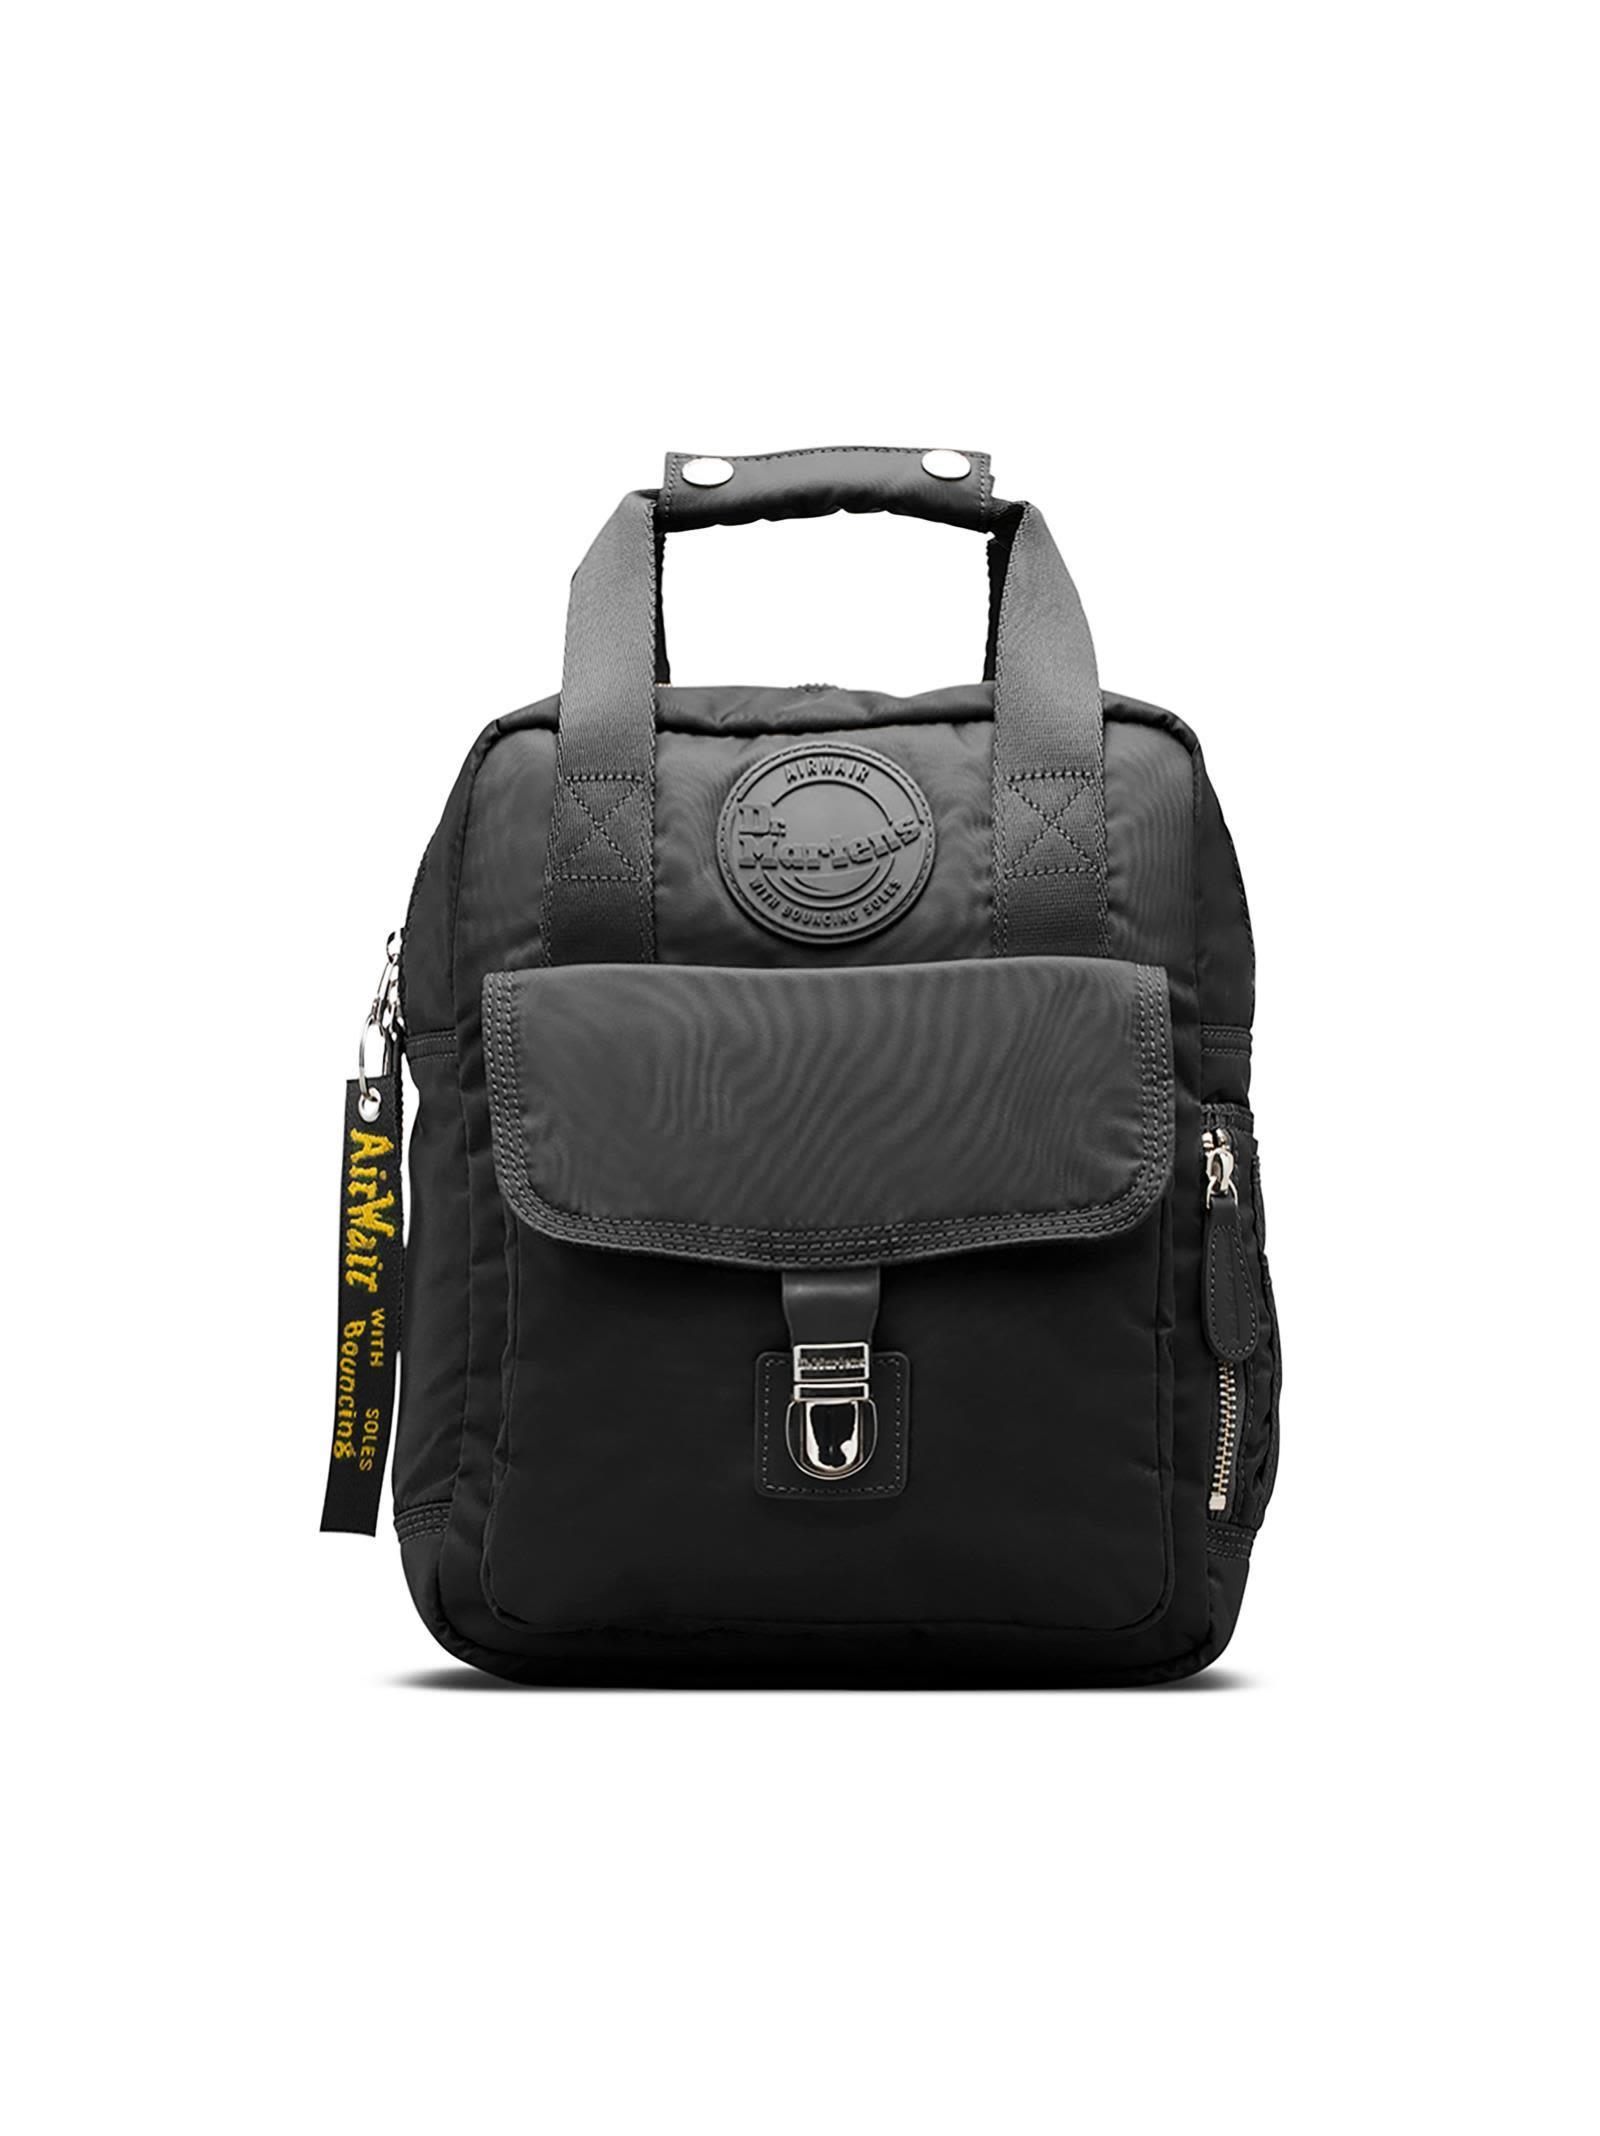 Dr. Martens Small Backpack In Black Nylon. In Nero